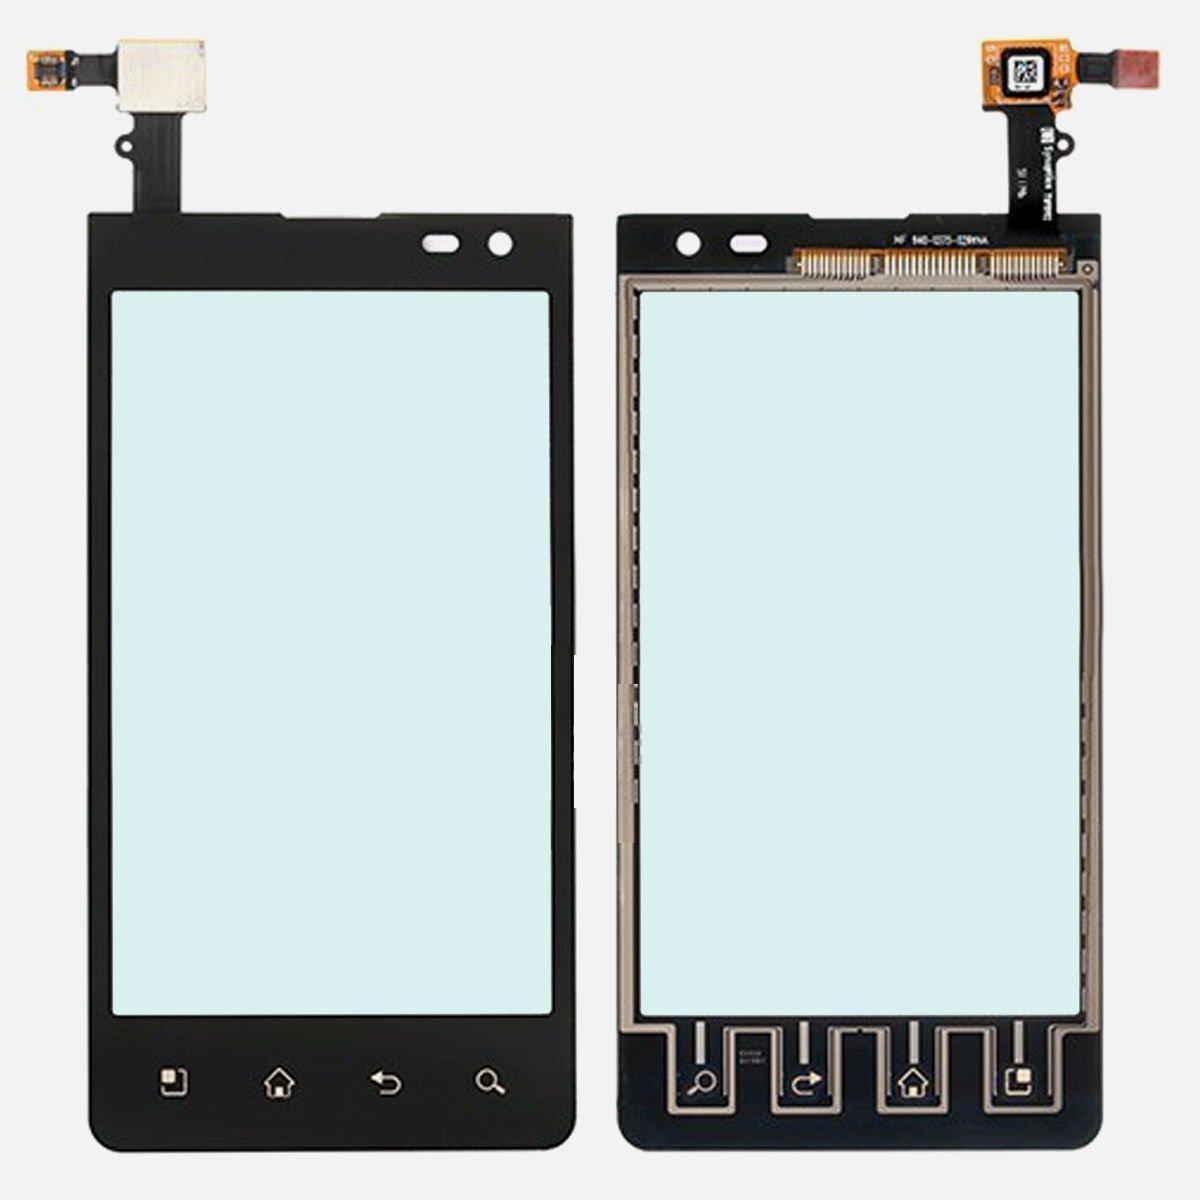 New OEM Verizon LG Lucid VS840 Front Panel Touch Glass Lens Digitizer Screen Part